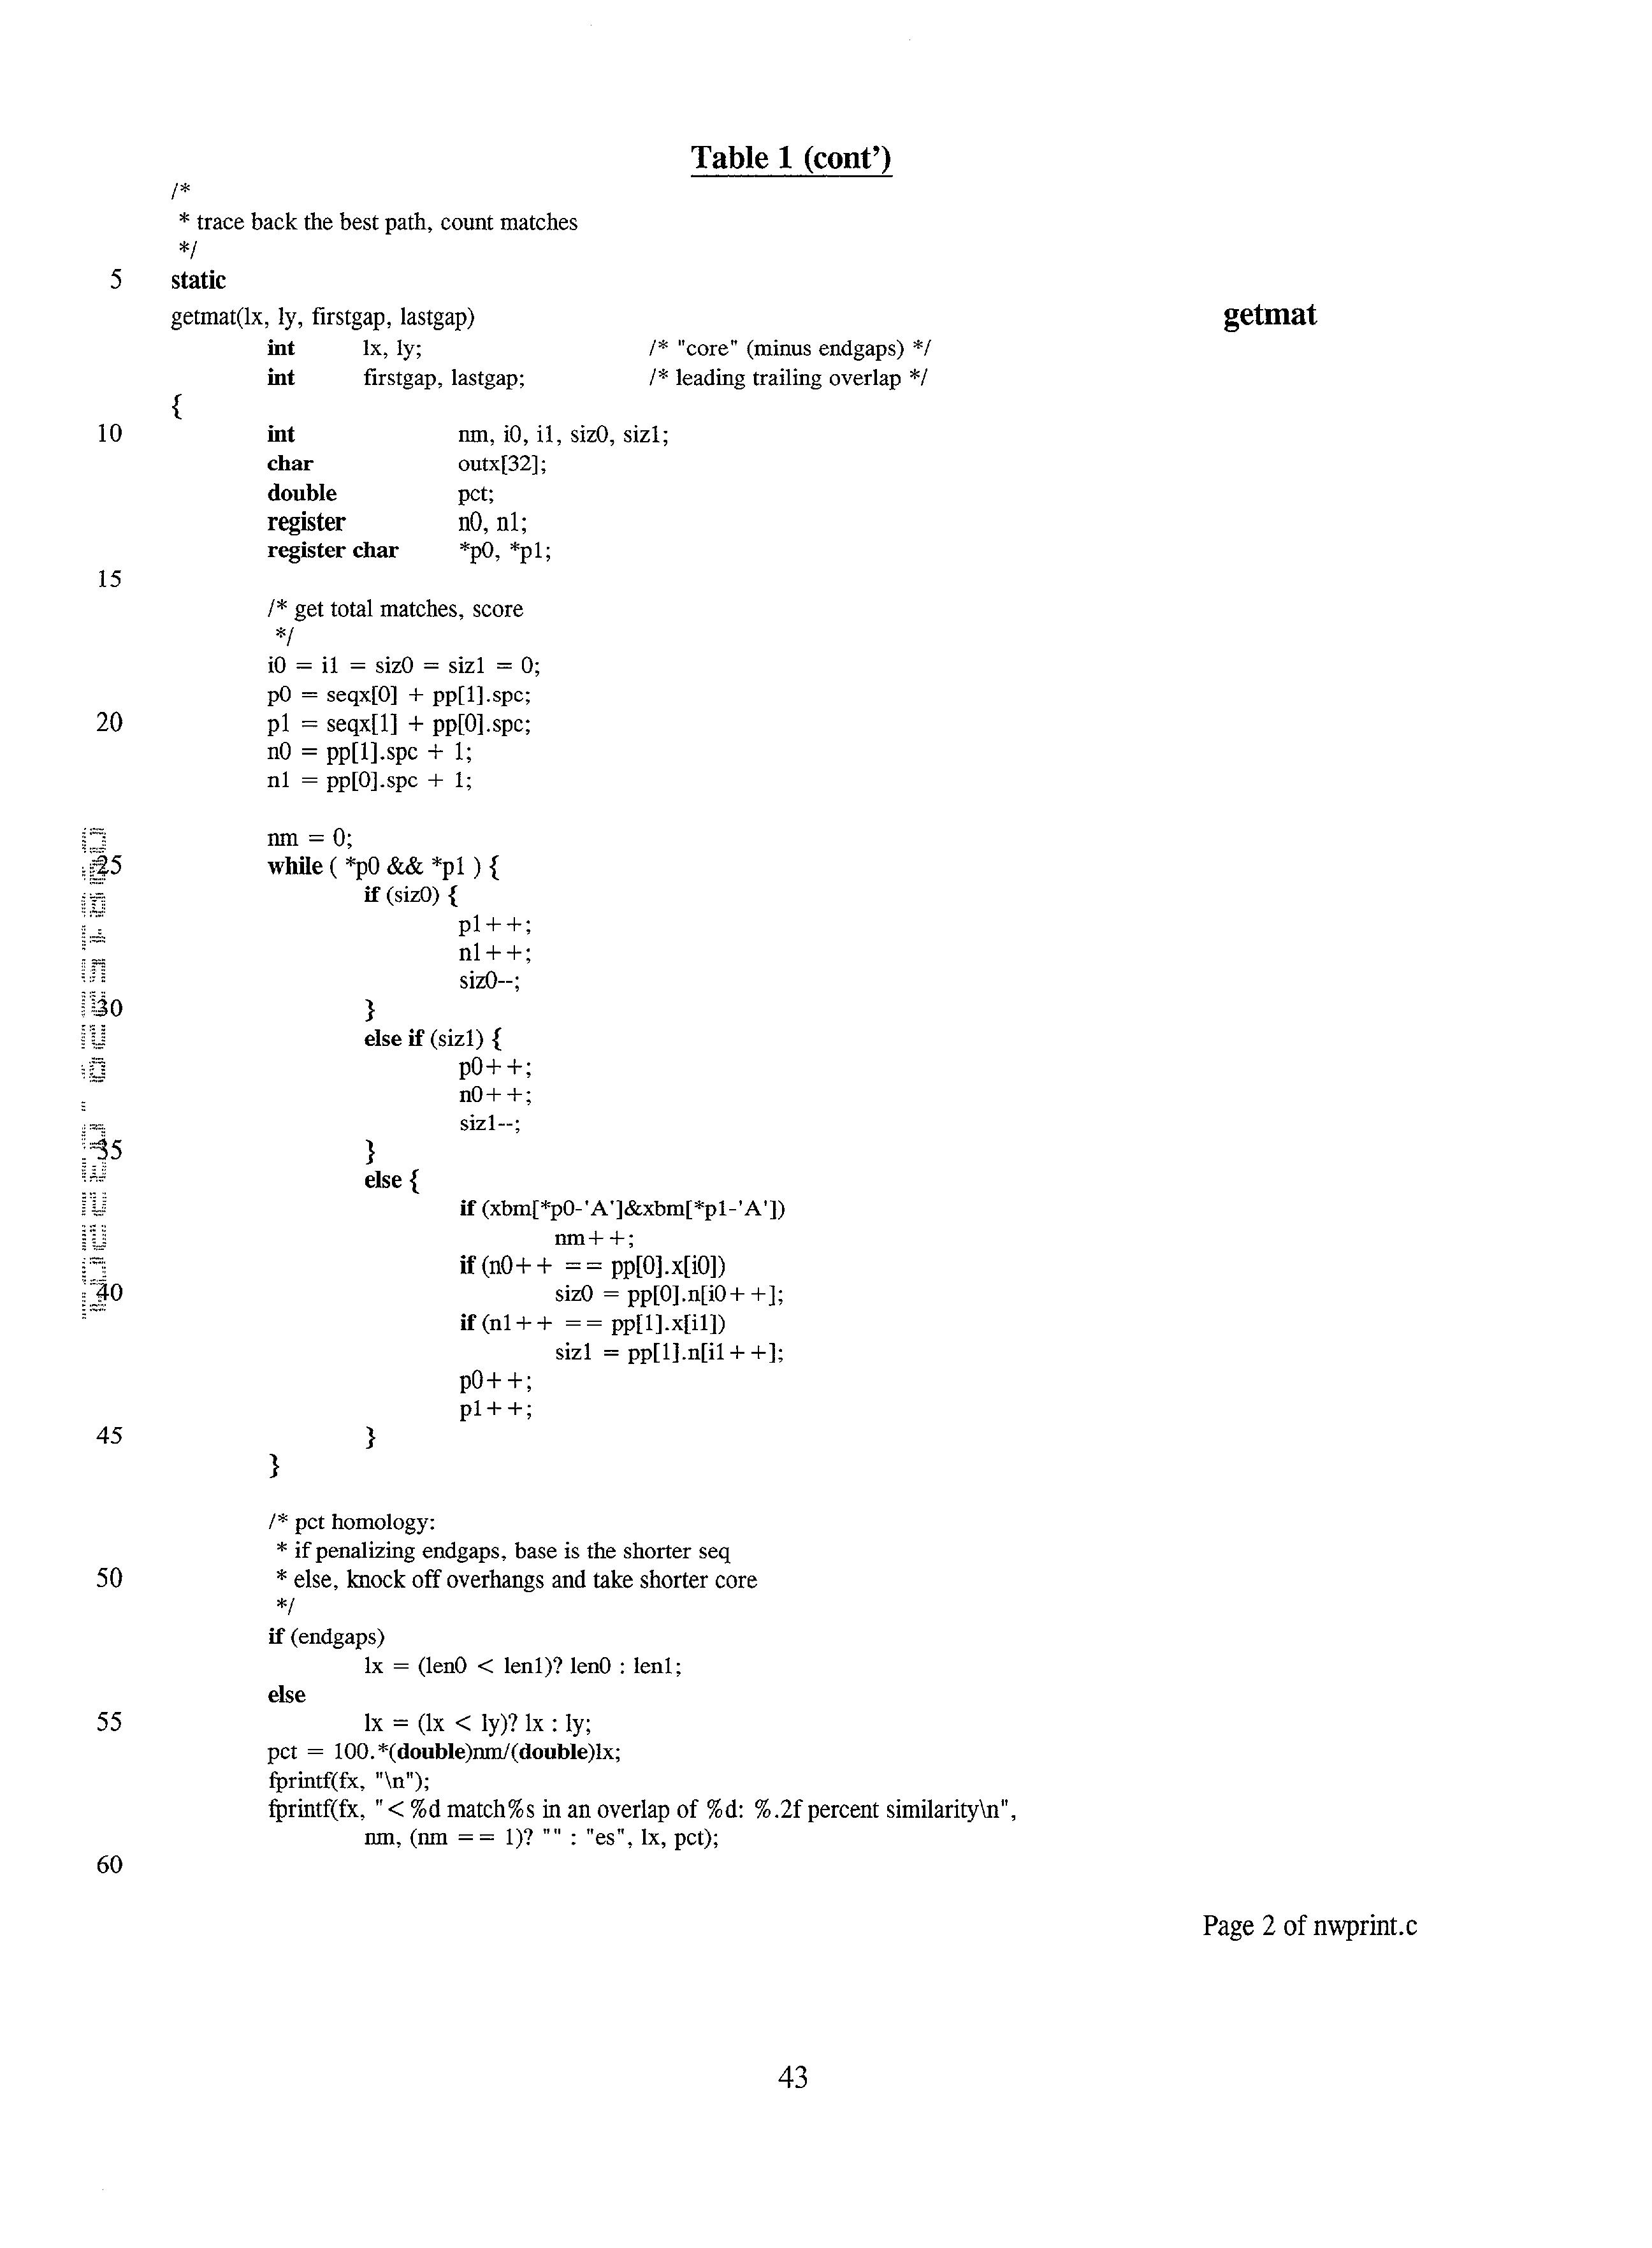 Langfristiger handel mit binären optionen seriös foto 7